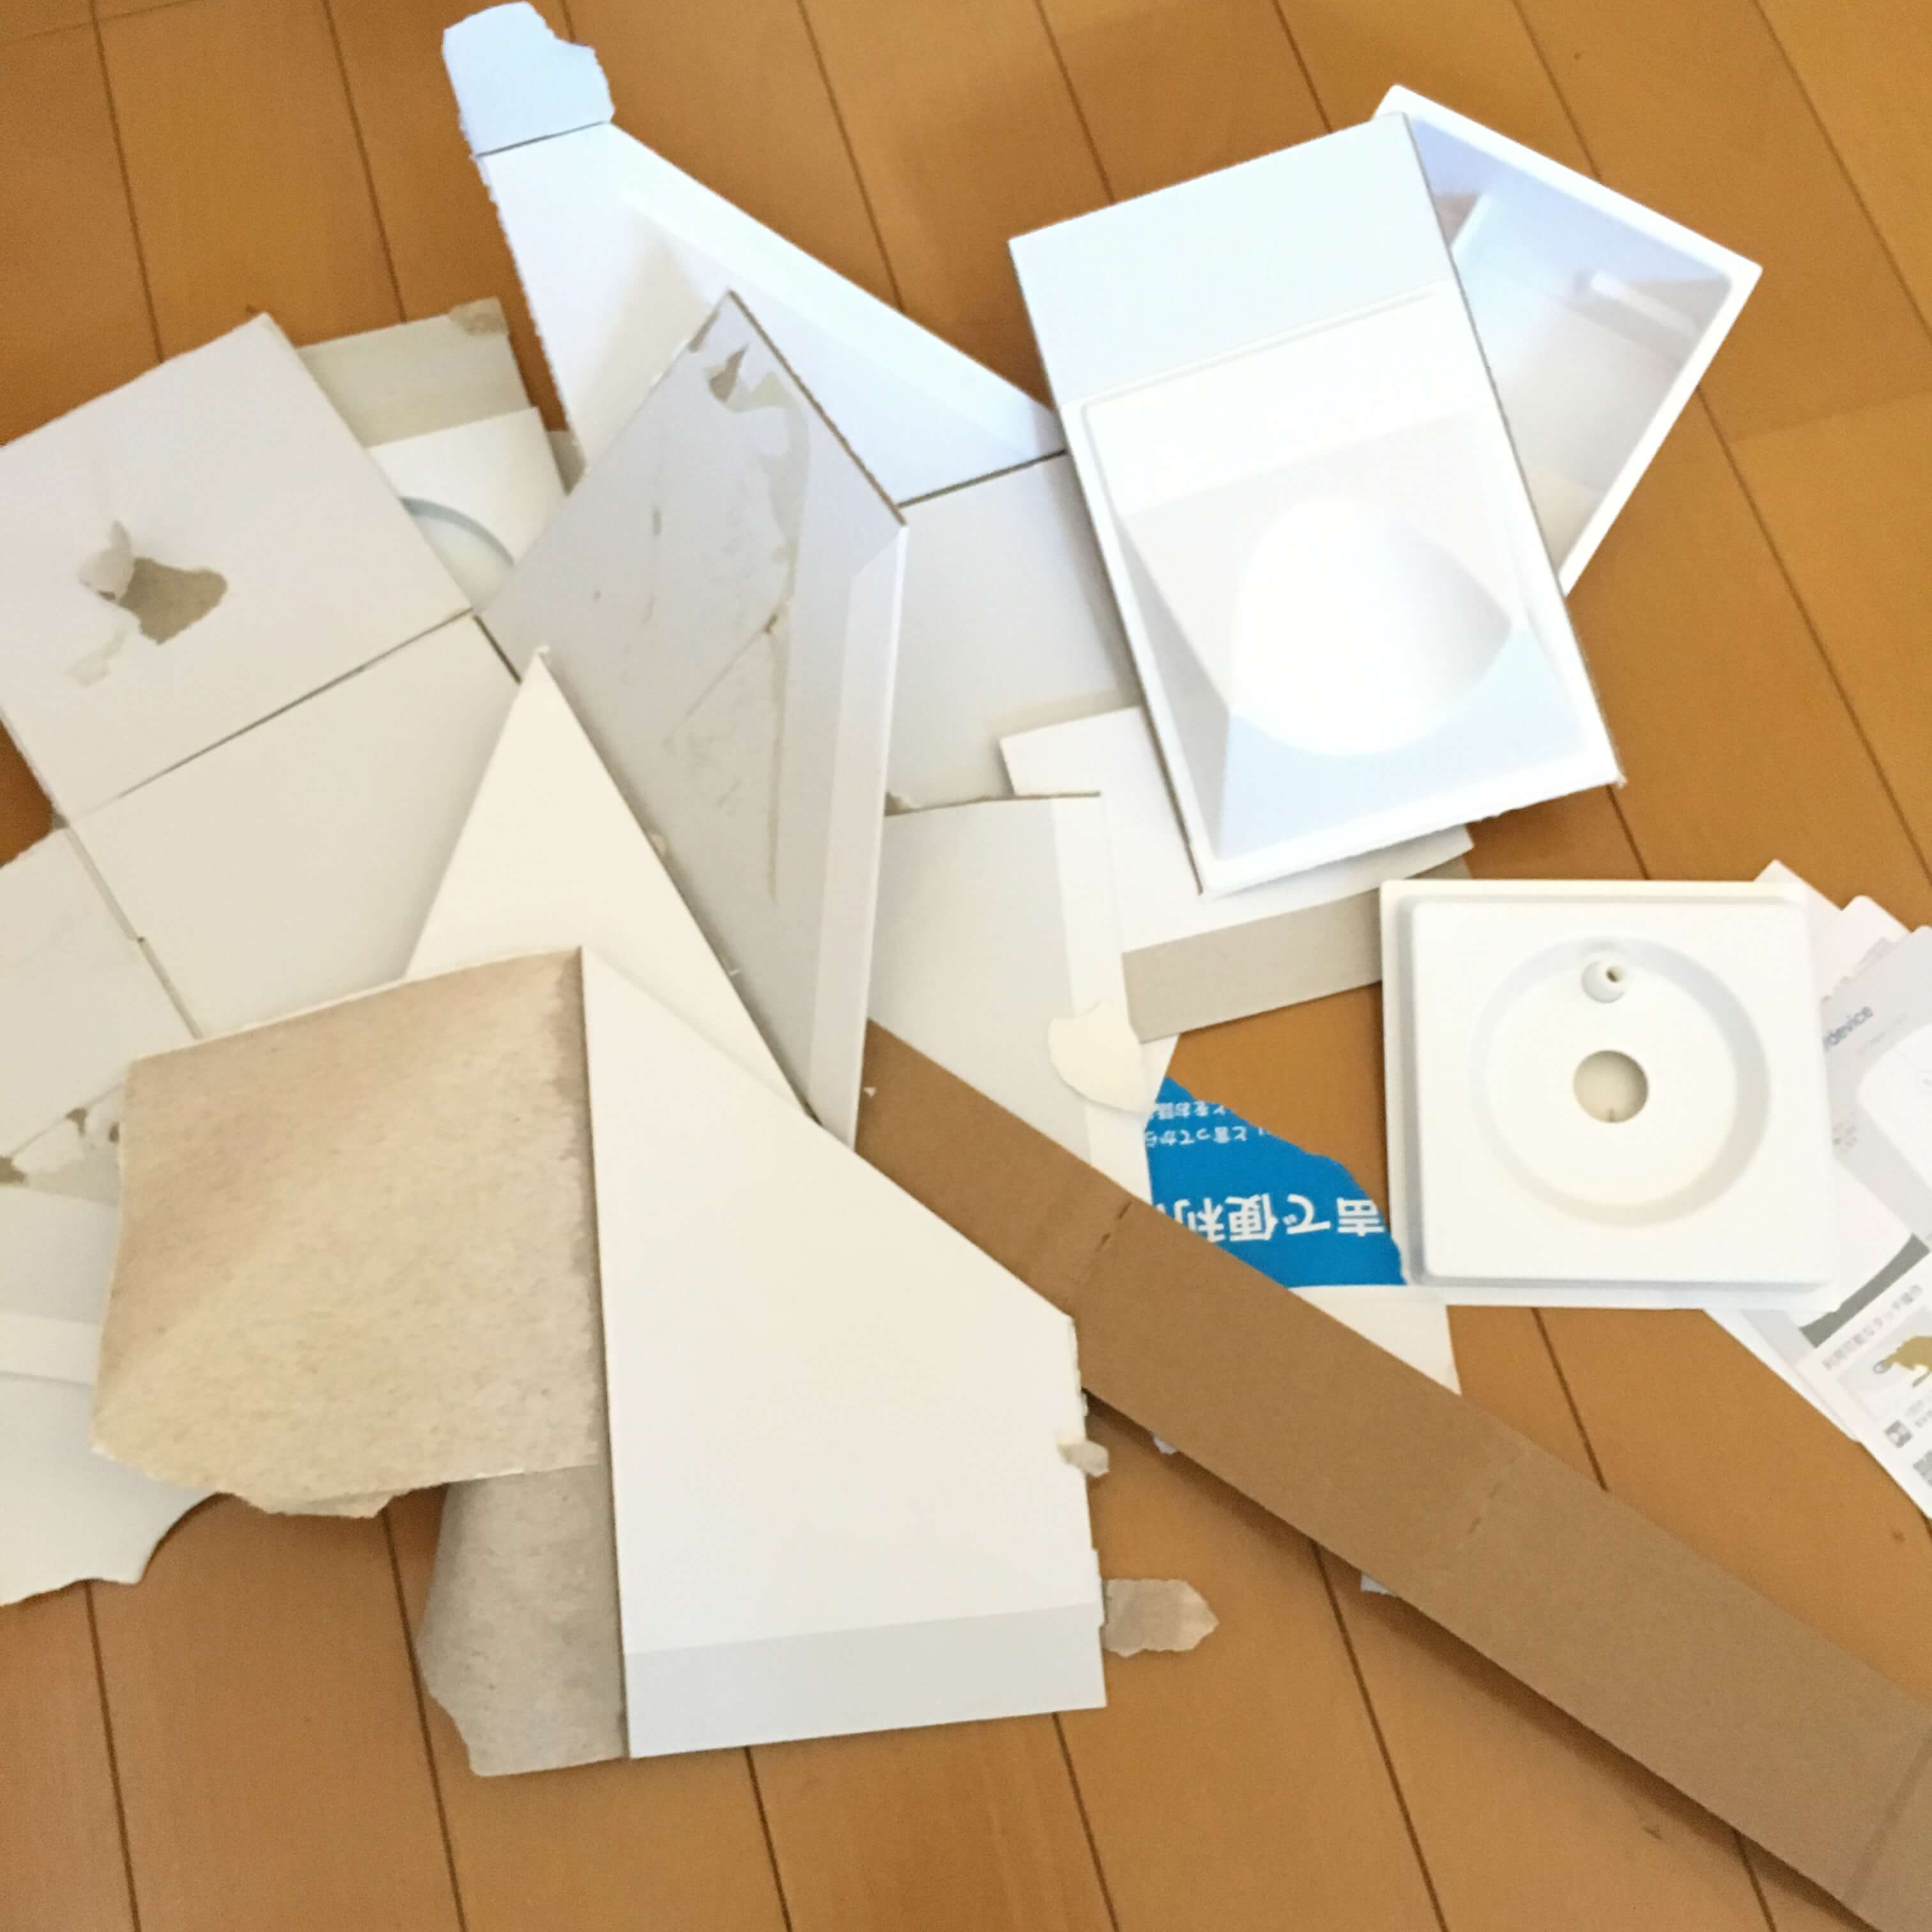 google home 外箱のゴミ